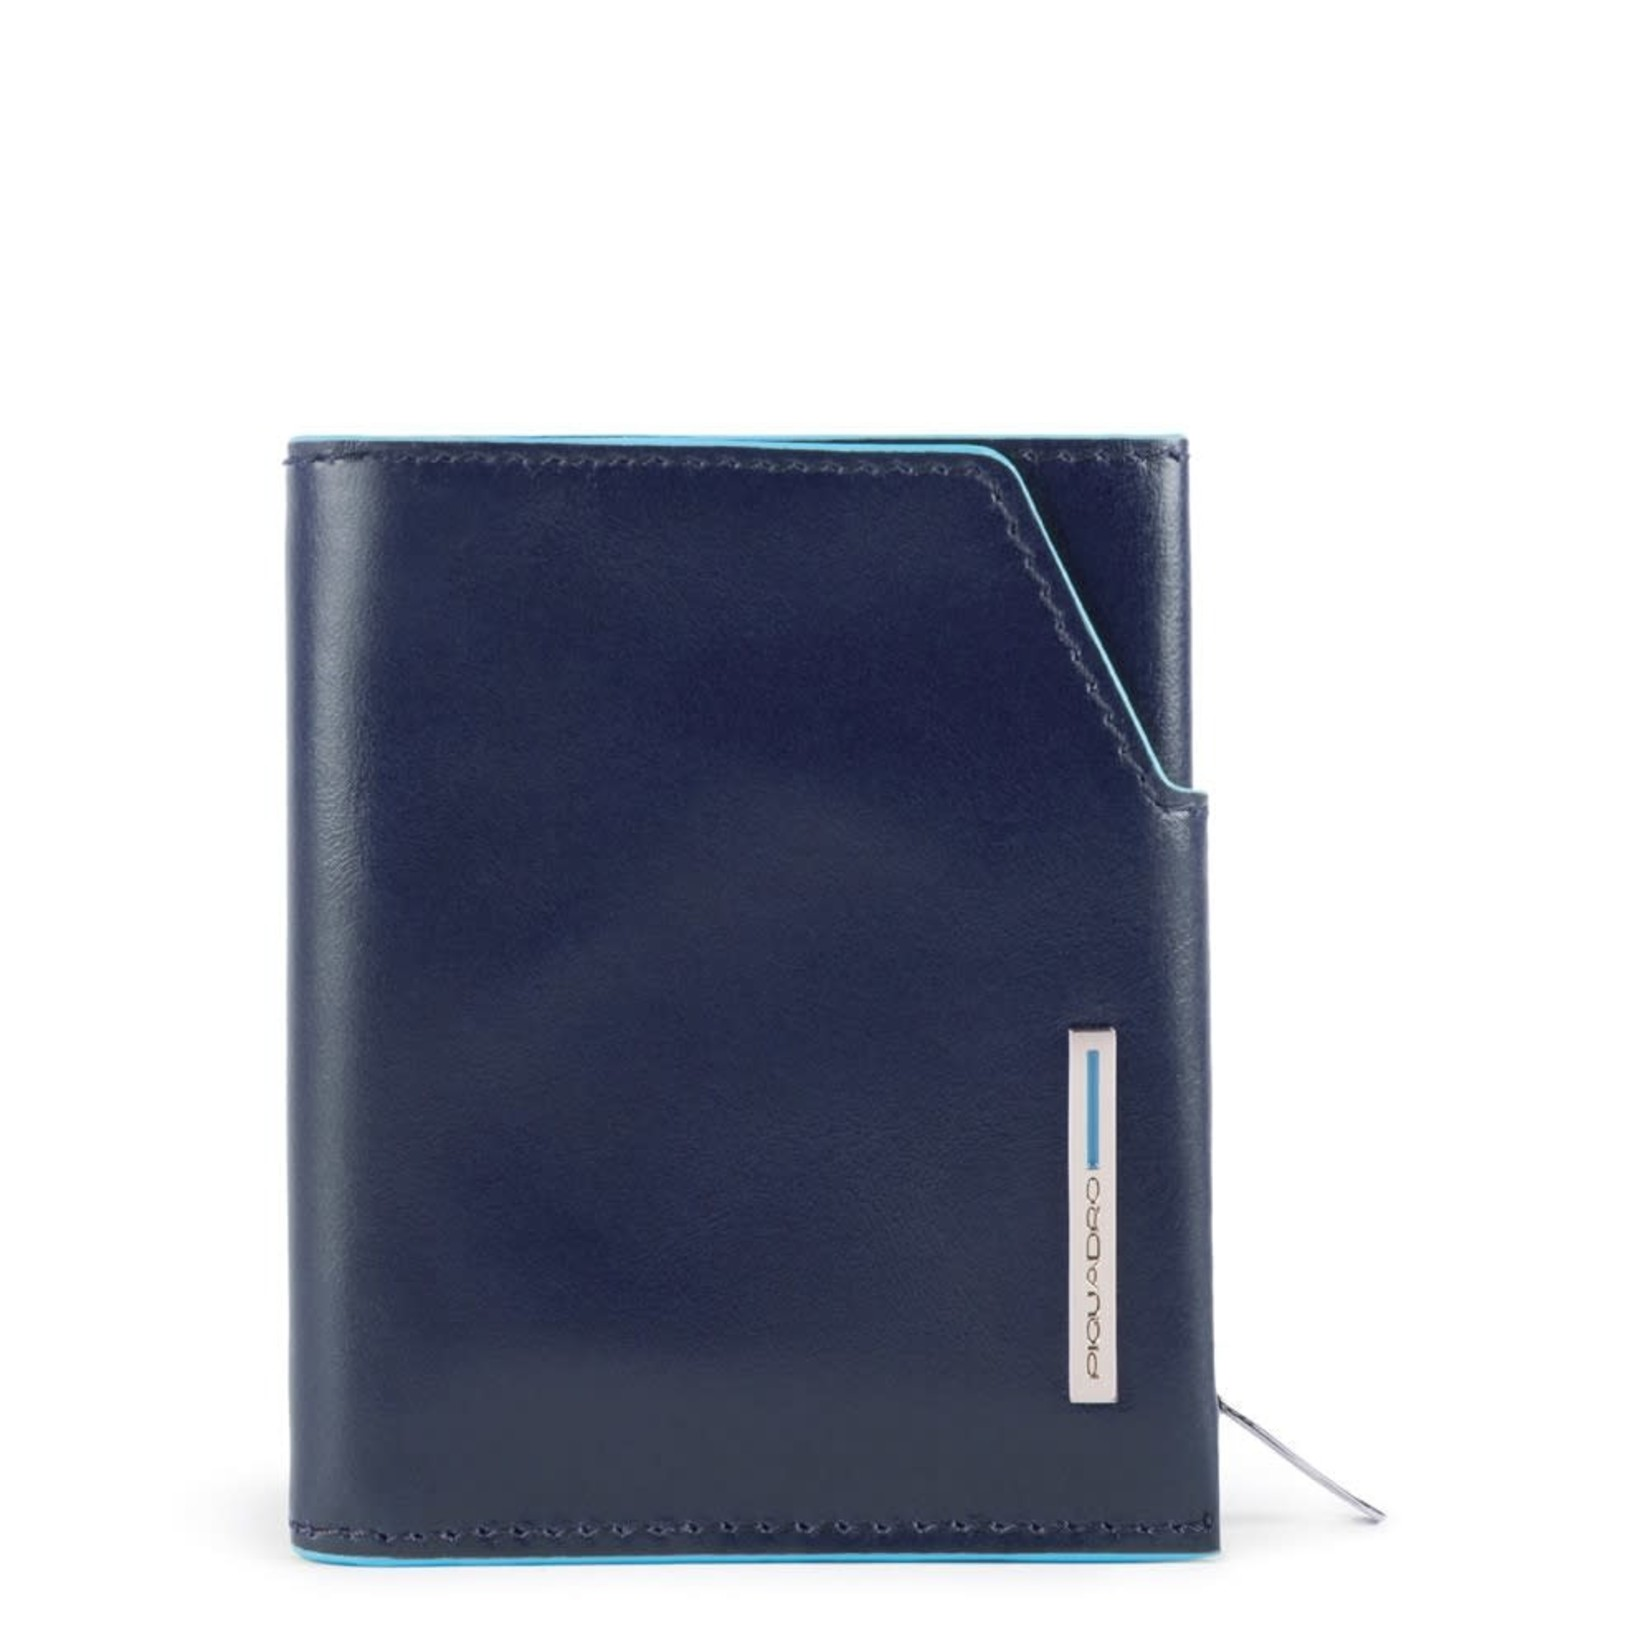 Piquadro Portemonnee Blue Square Blue